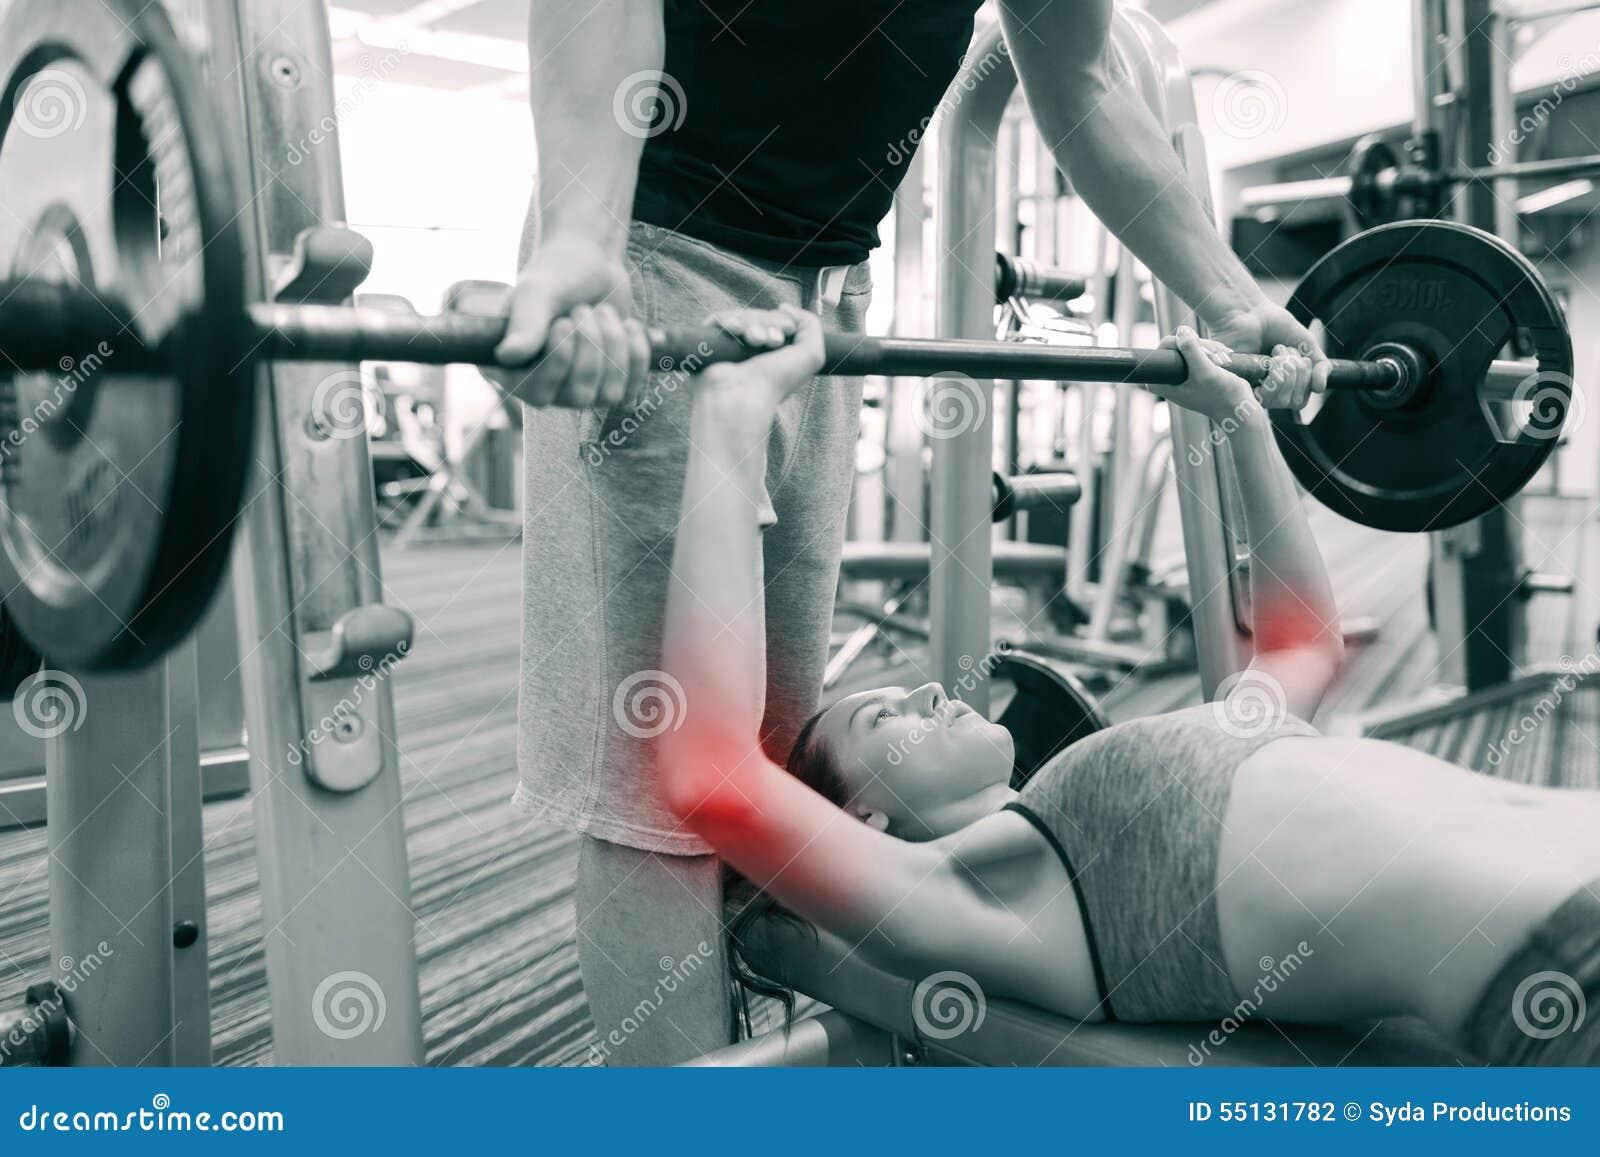 v屈曲,屈曲伤害和人杠铃-少妇和概念教练员与个人体育在健身房的肌肉.中国电子竞技联合会图片